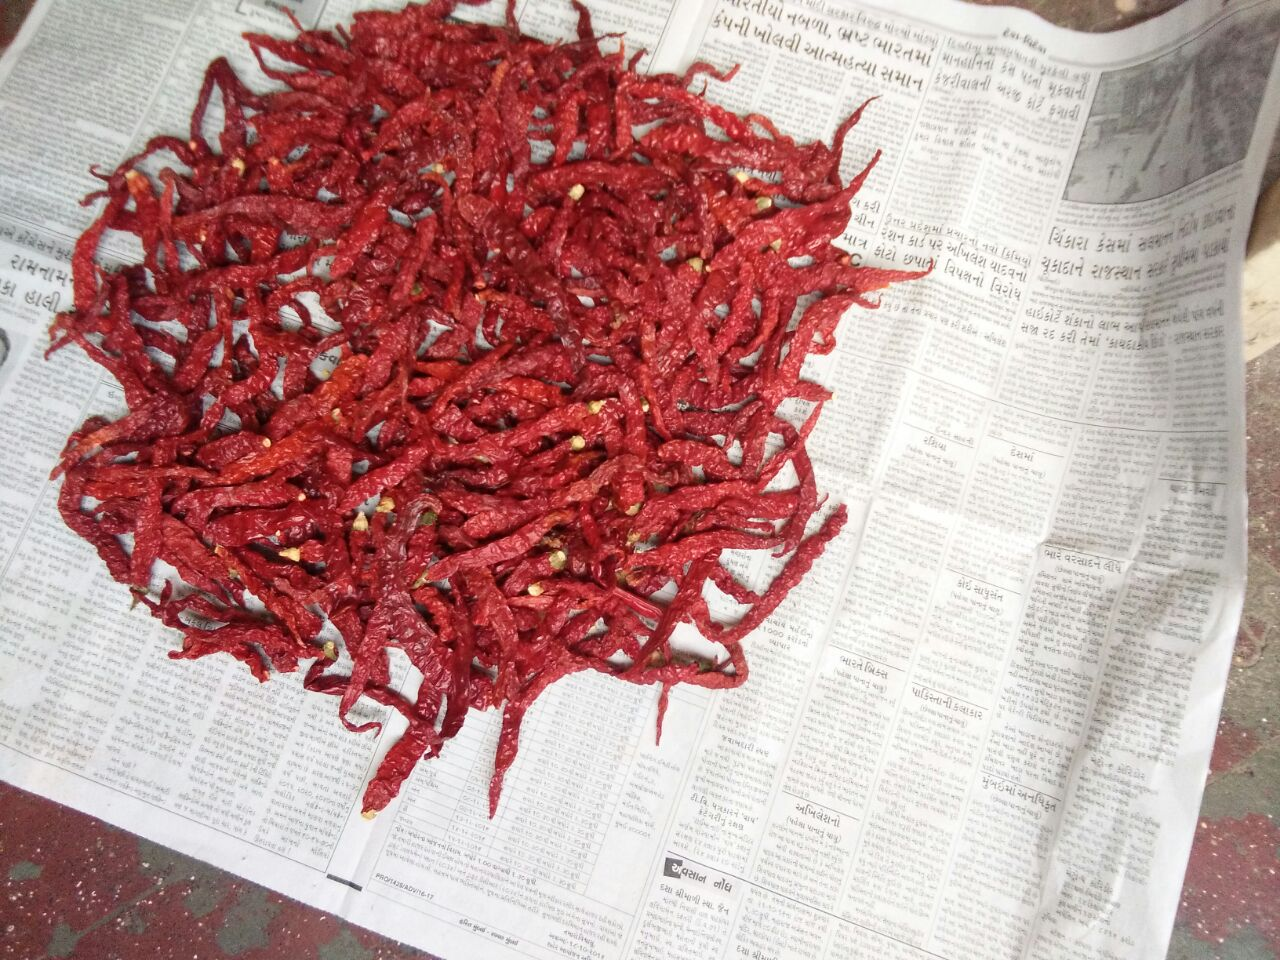 Byadigi chillies